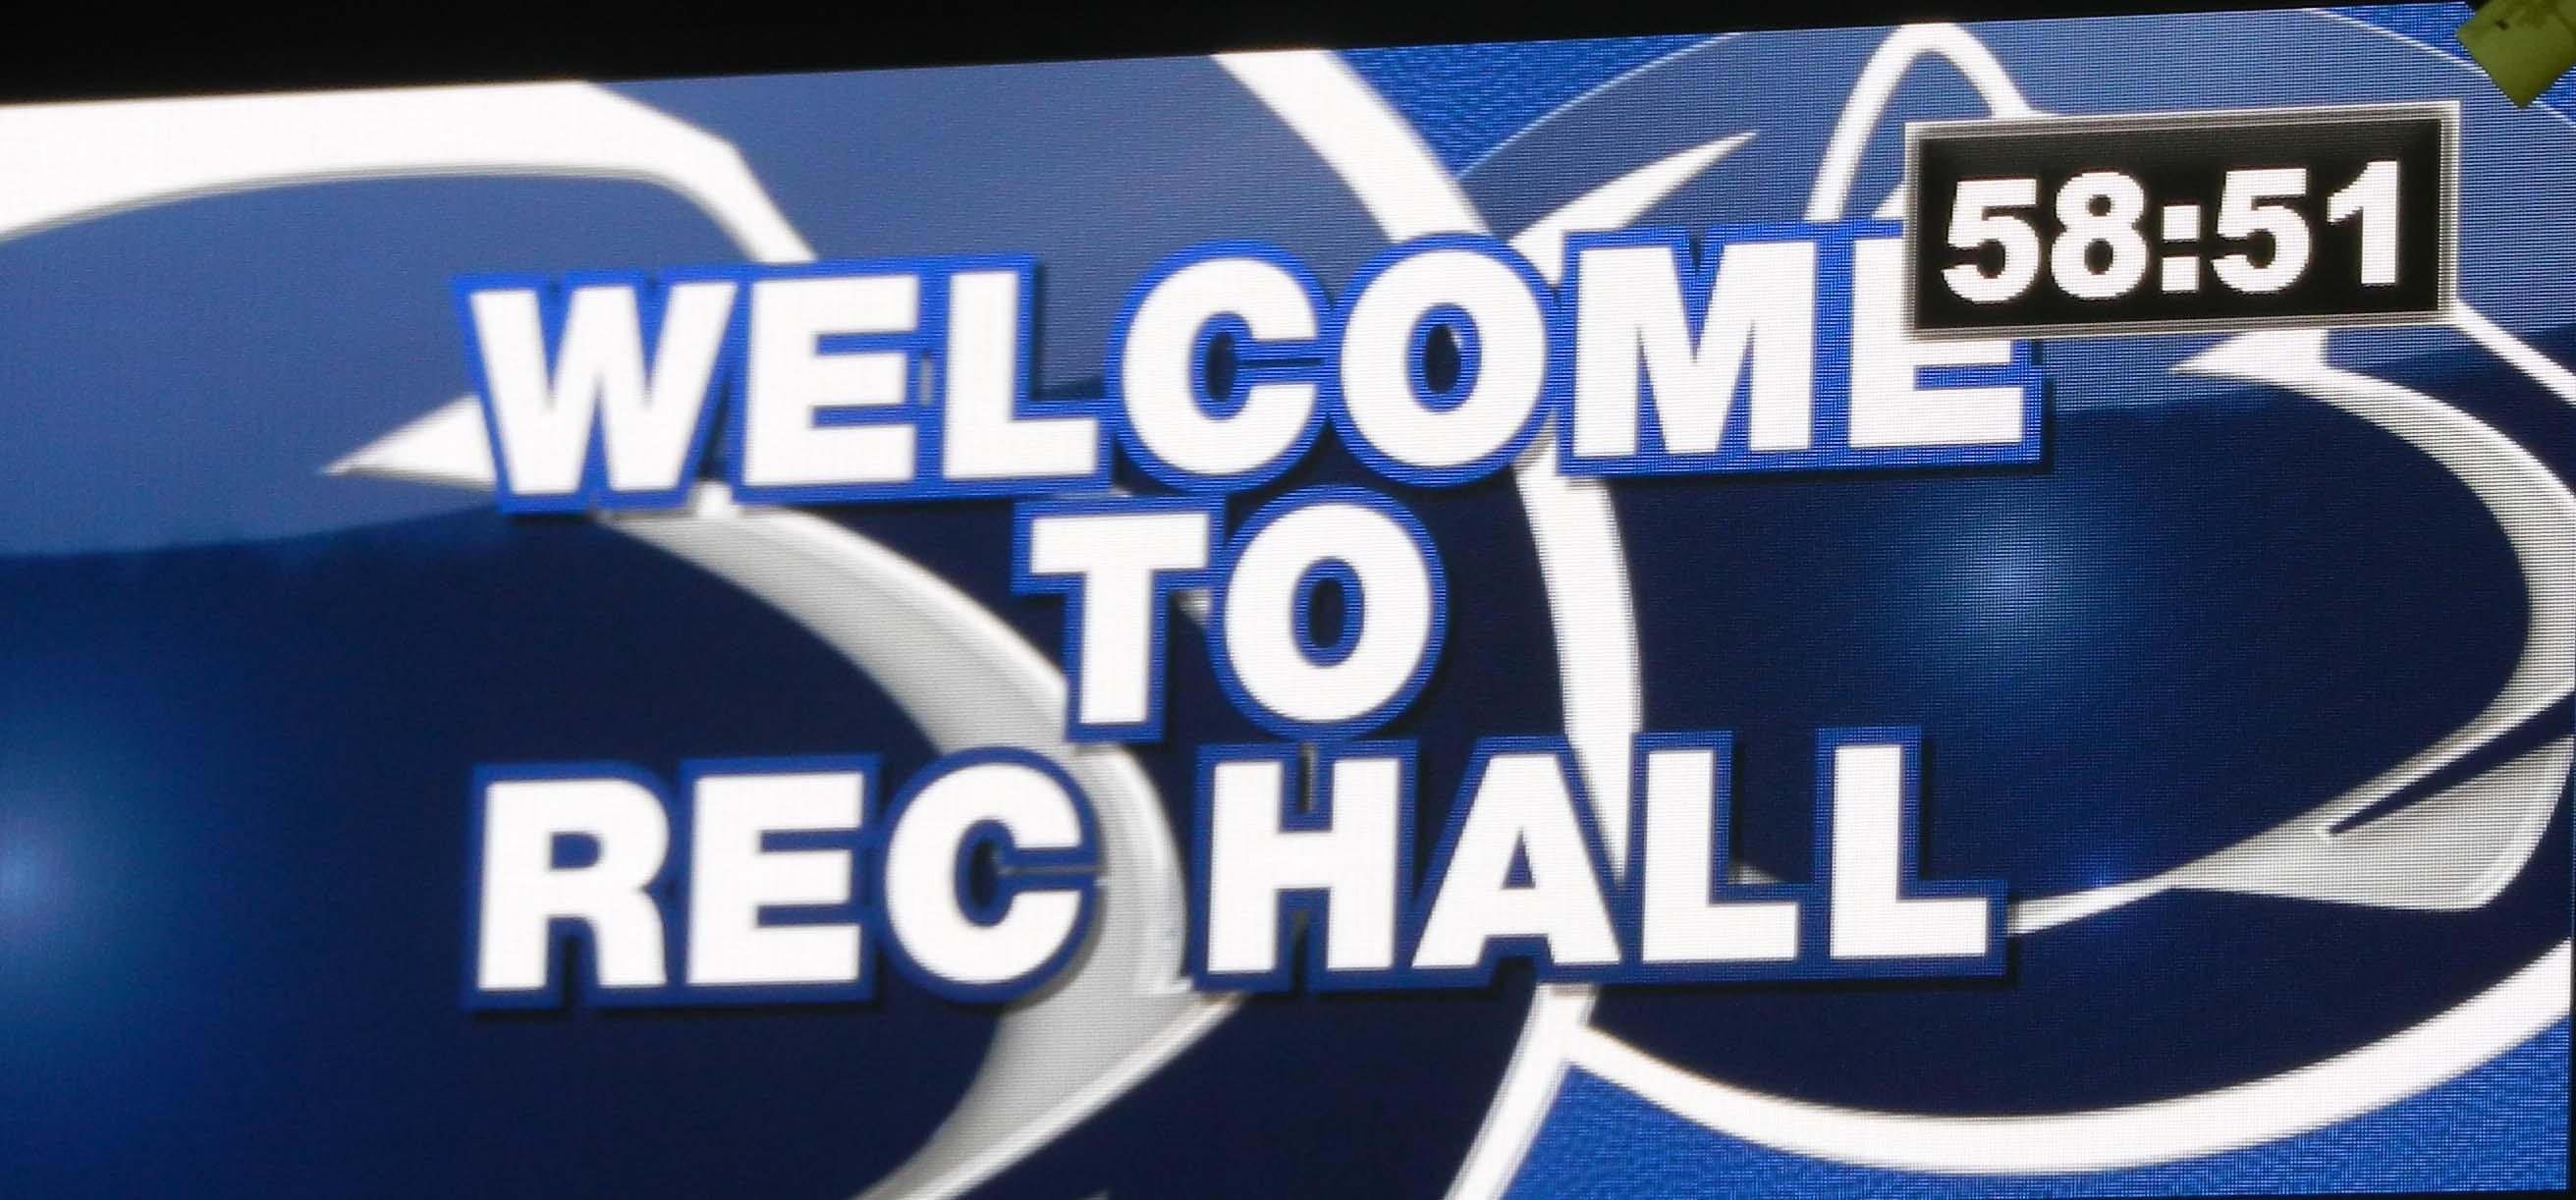 Rec Hall Scoreboard Welcome Closeup